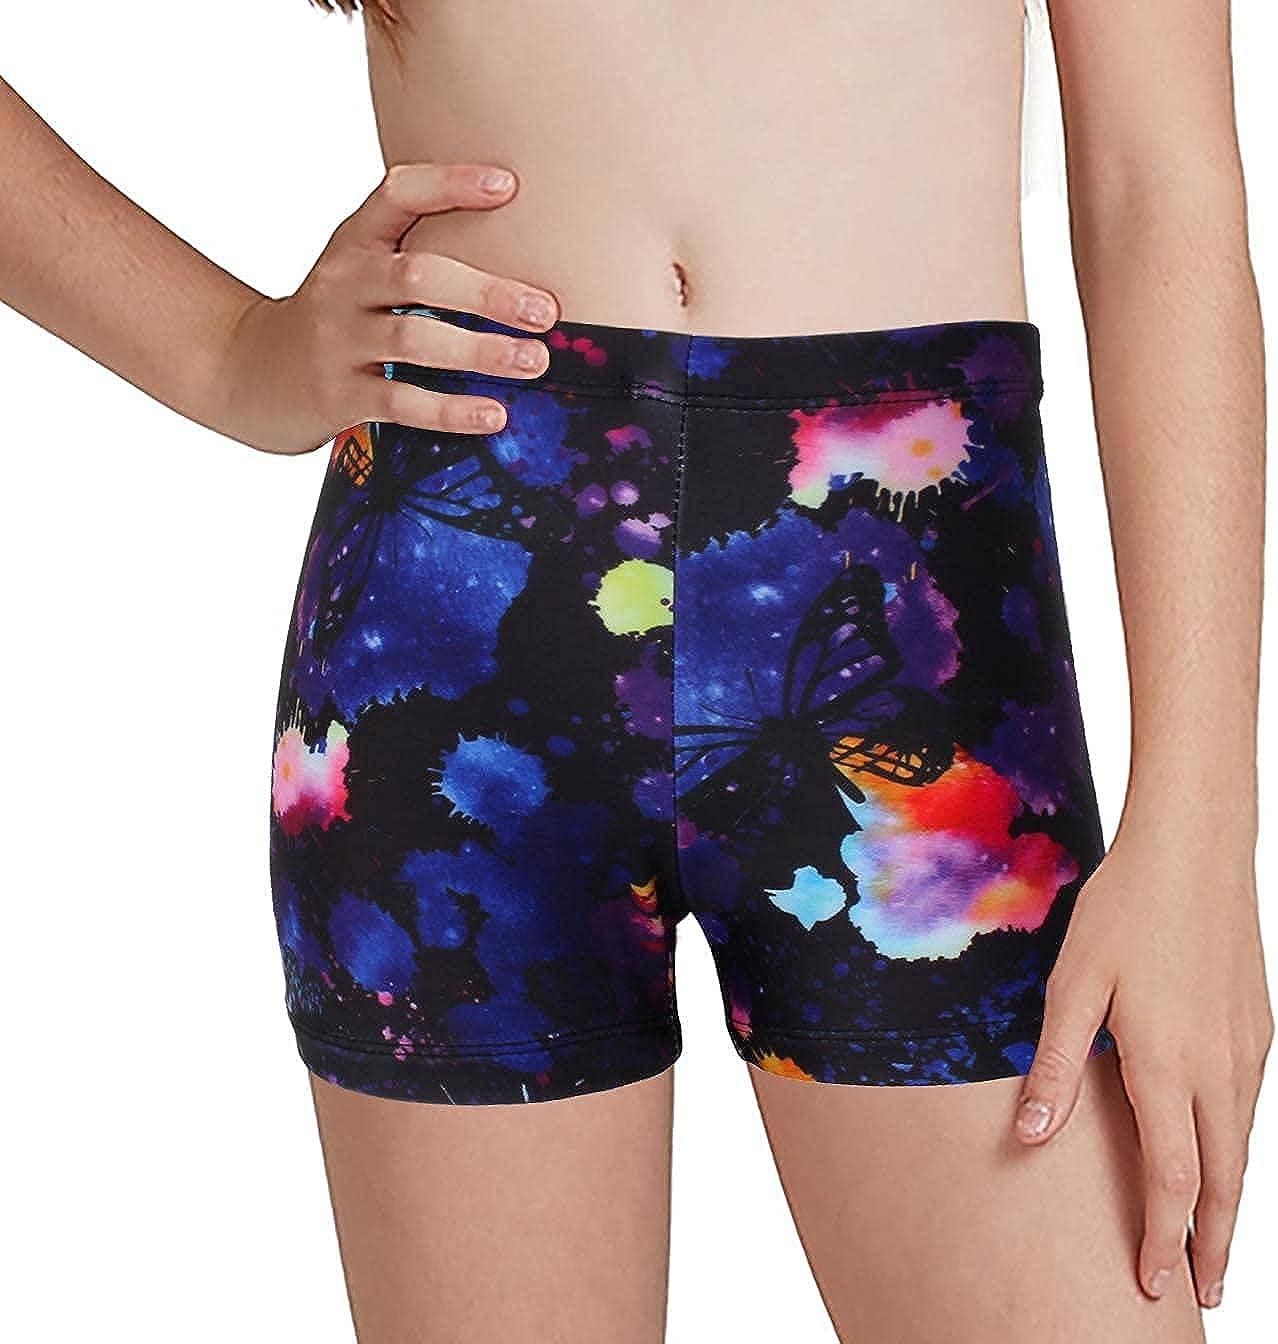 MODAFANS Superior Leotards for Girls Gymnastics with Baltimore Mall Dance unitard Shorts